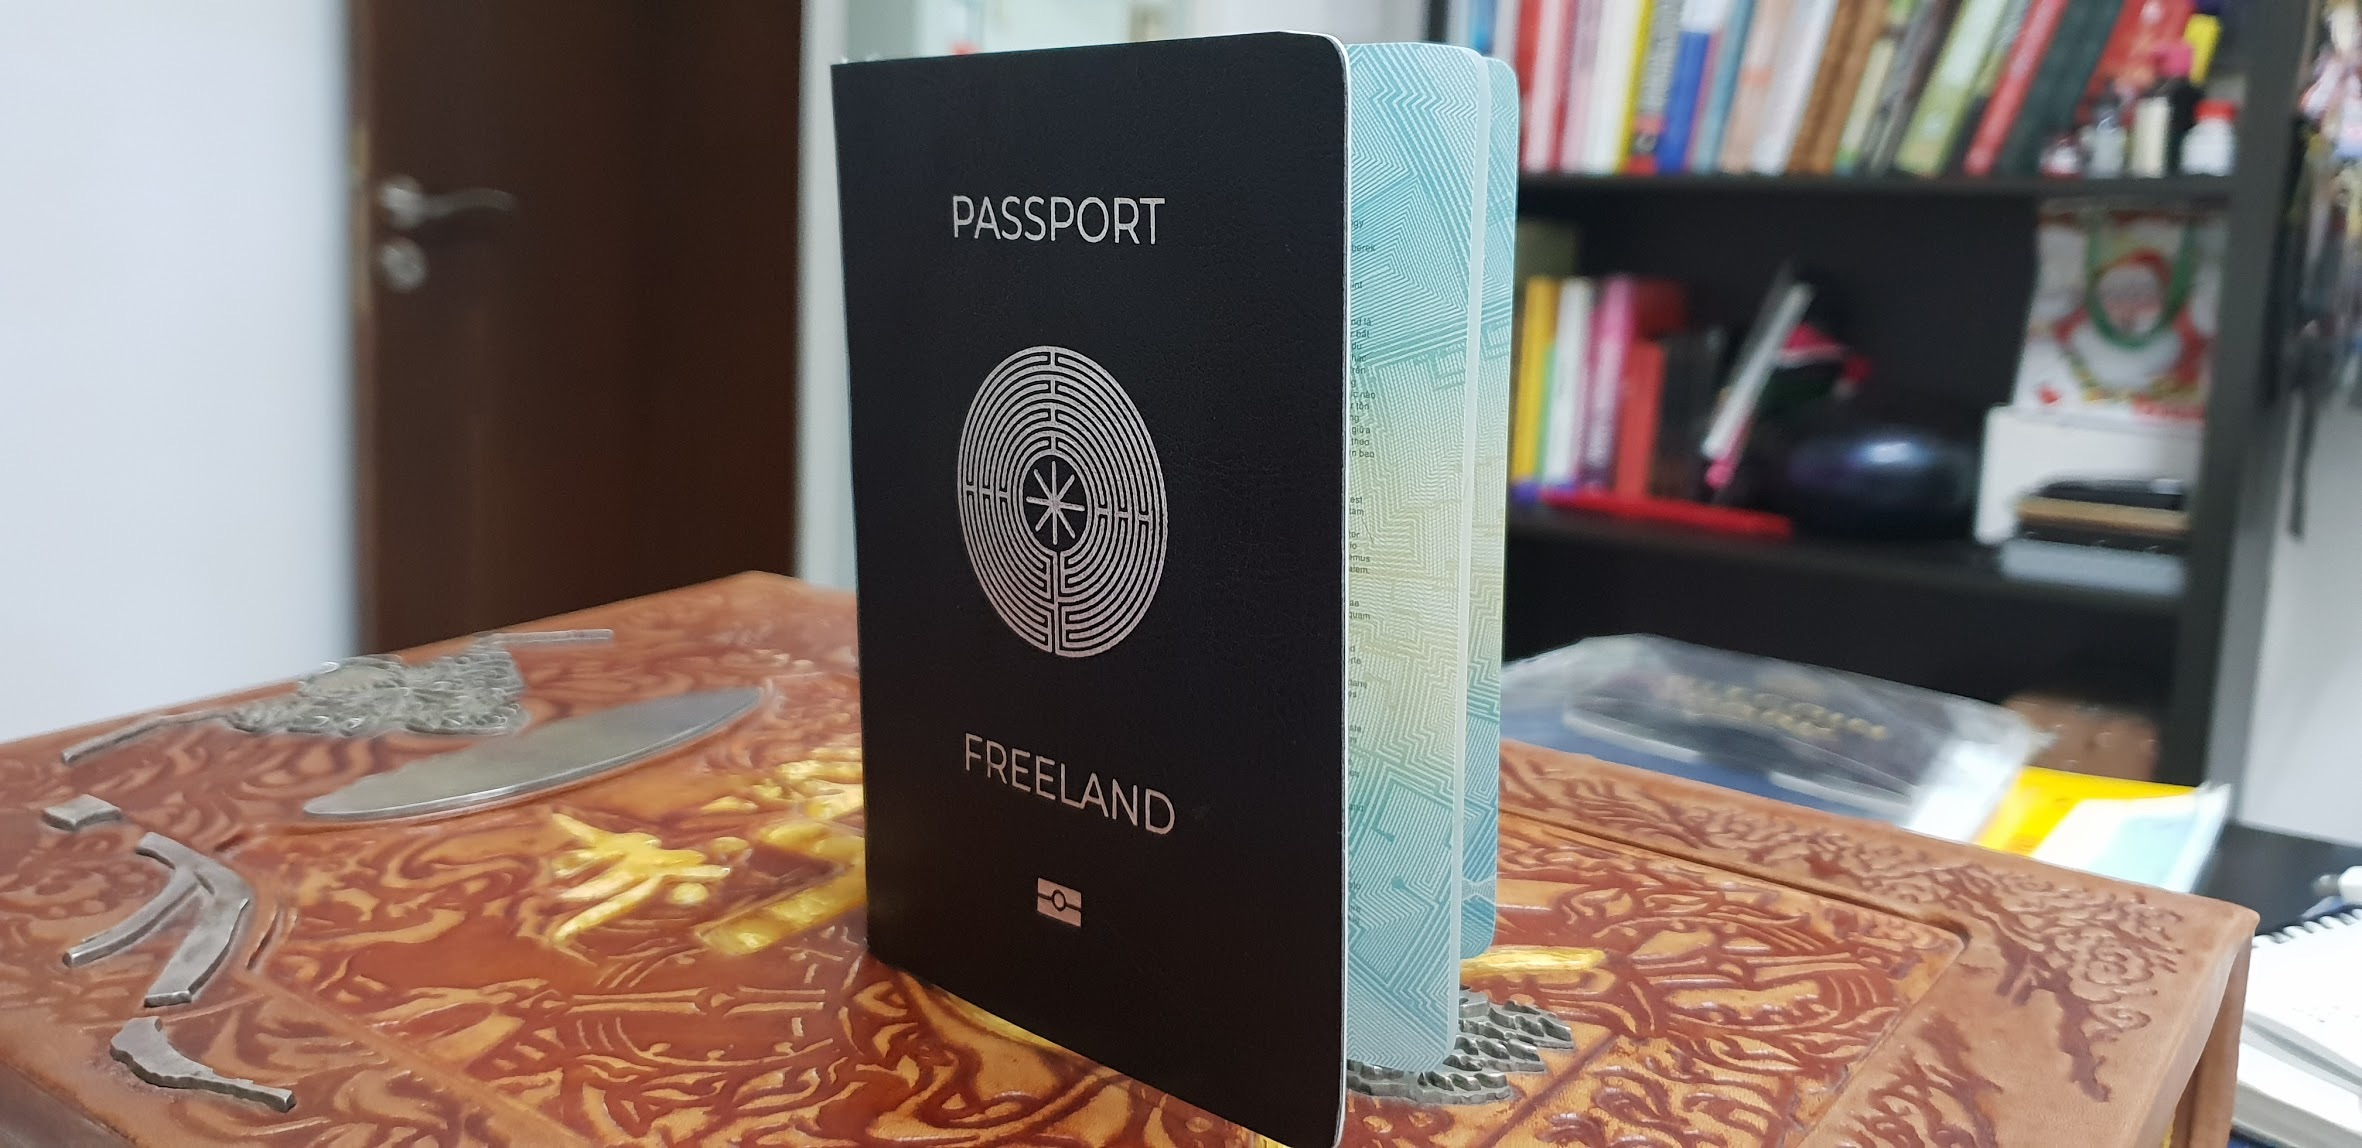 Паспорт Виртуального государства Фриленд